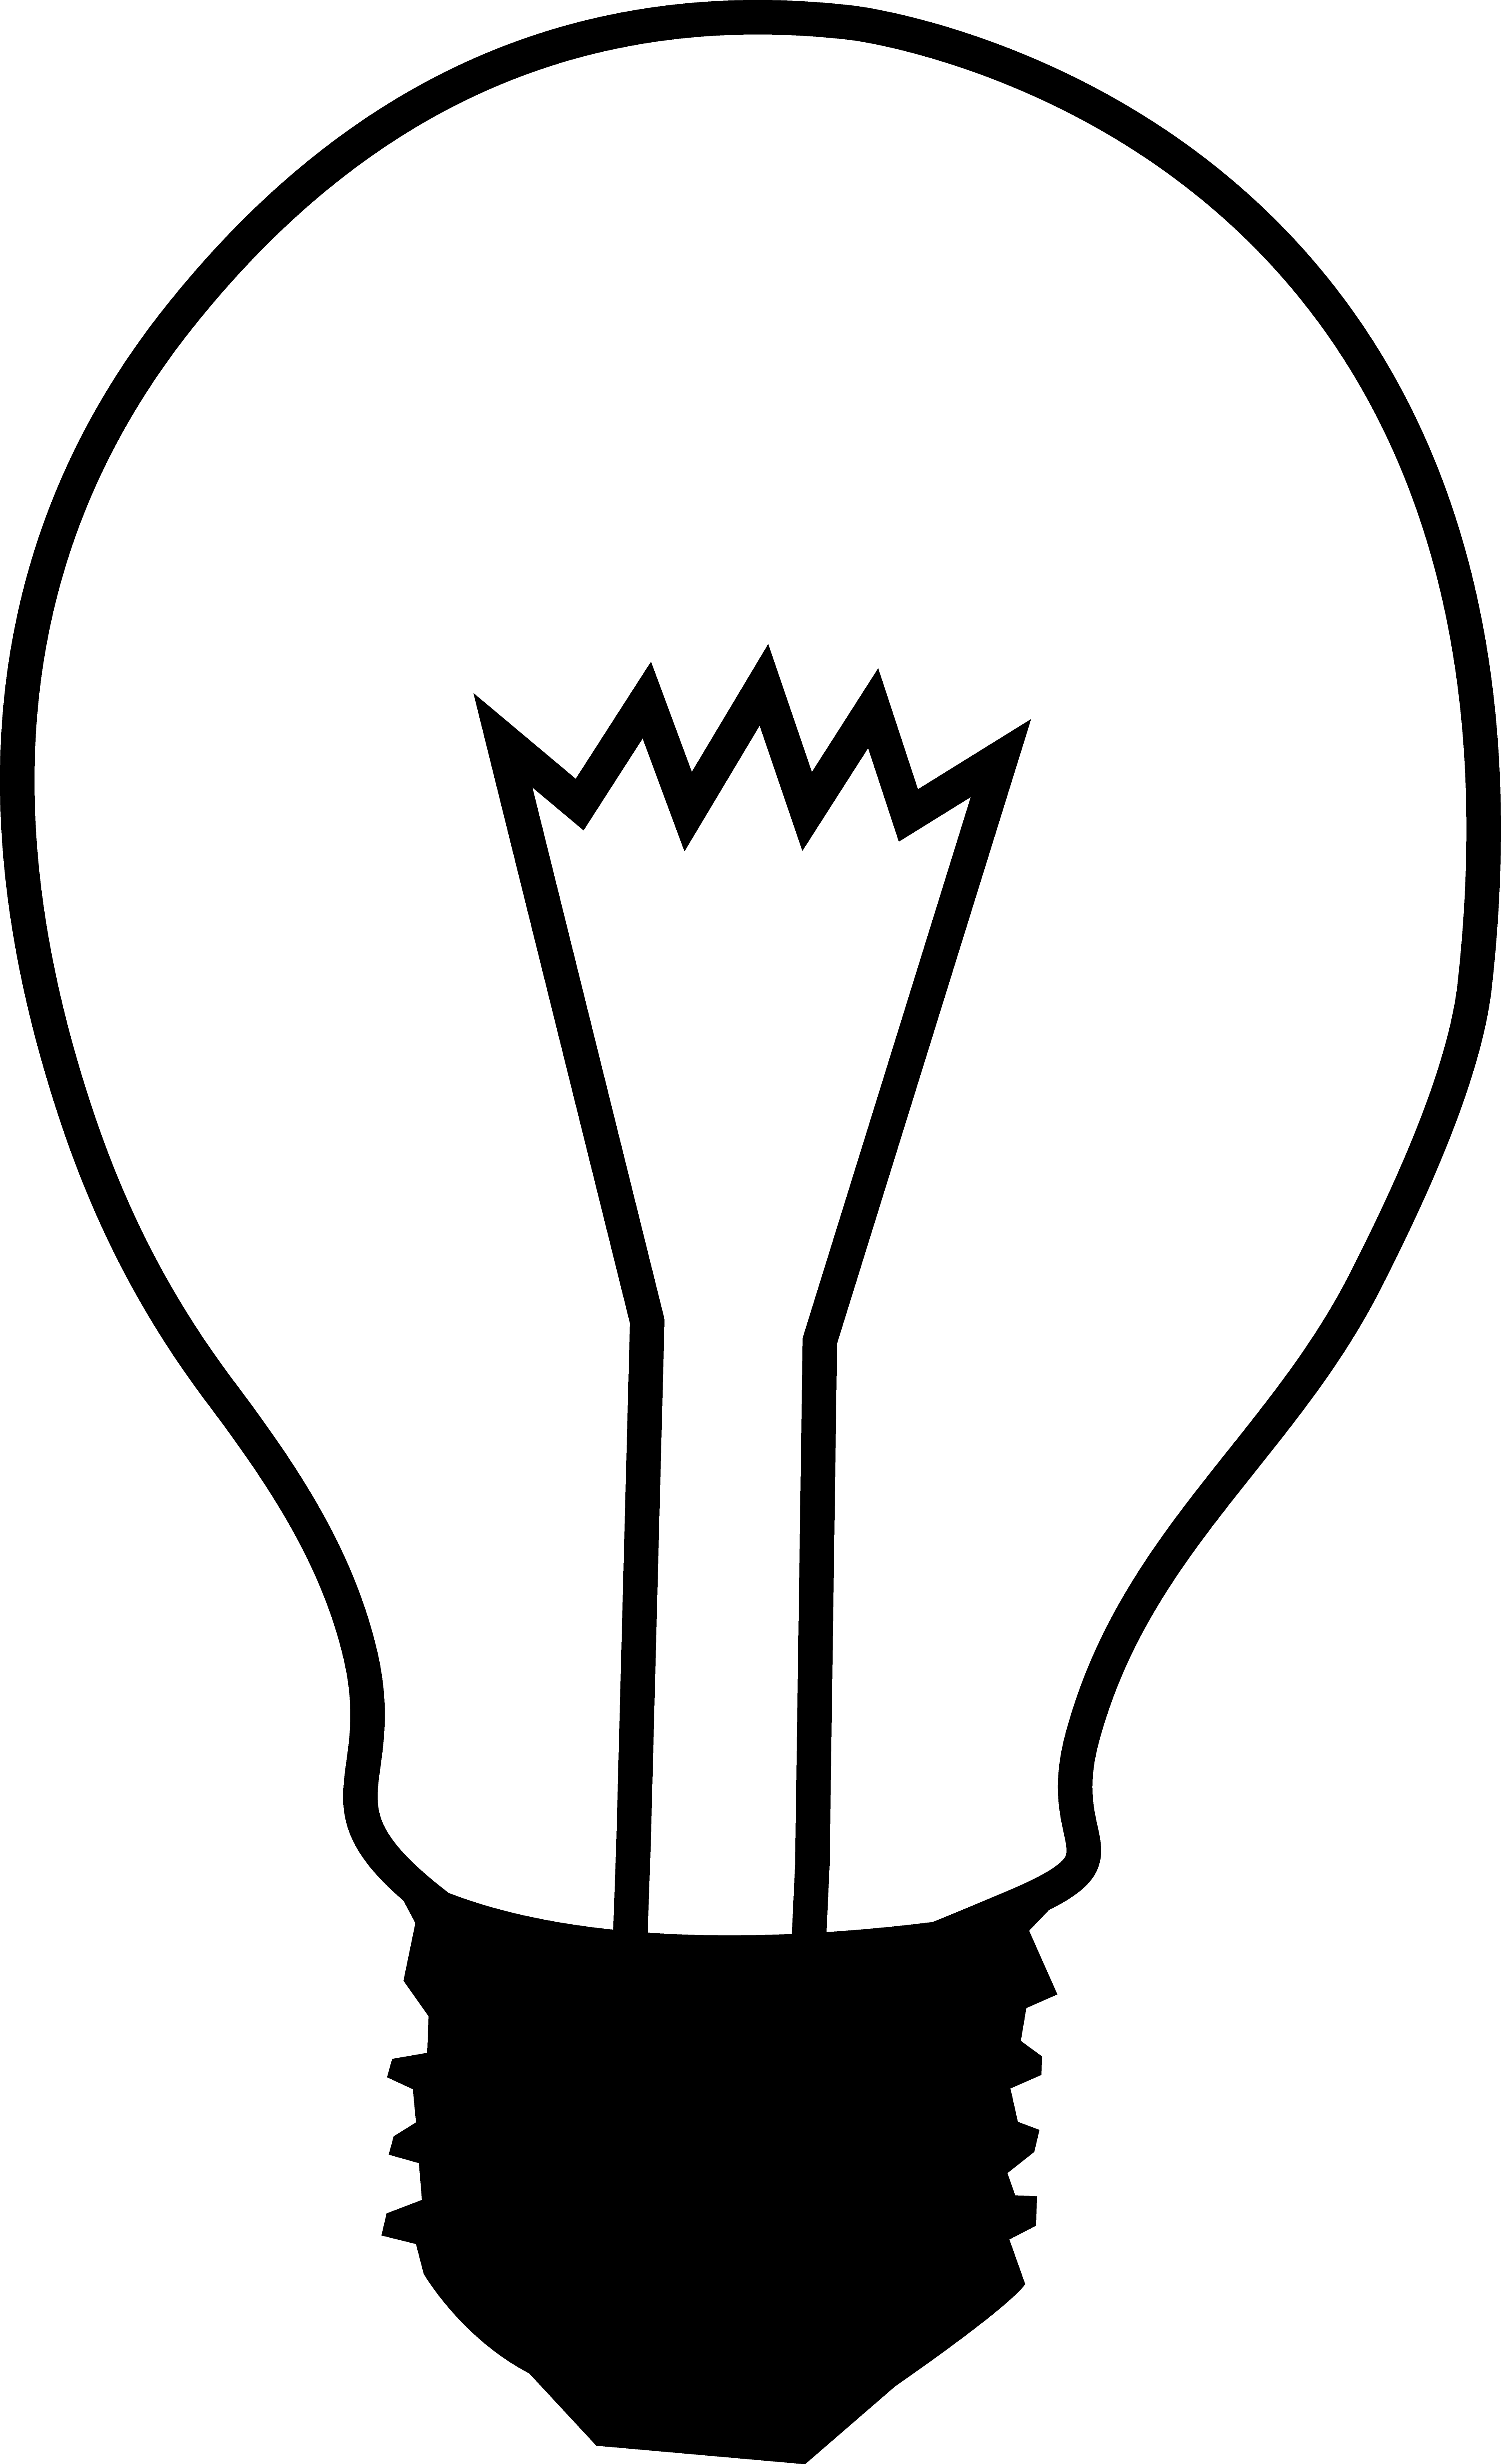 3629x5957 Drawn Light Bulb Bright